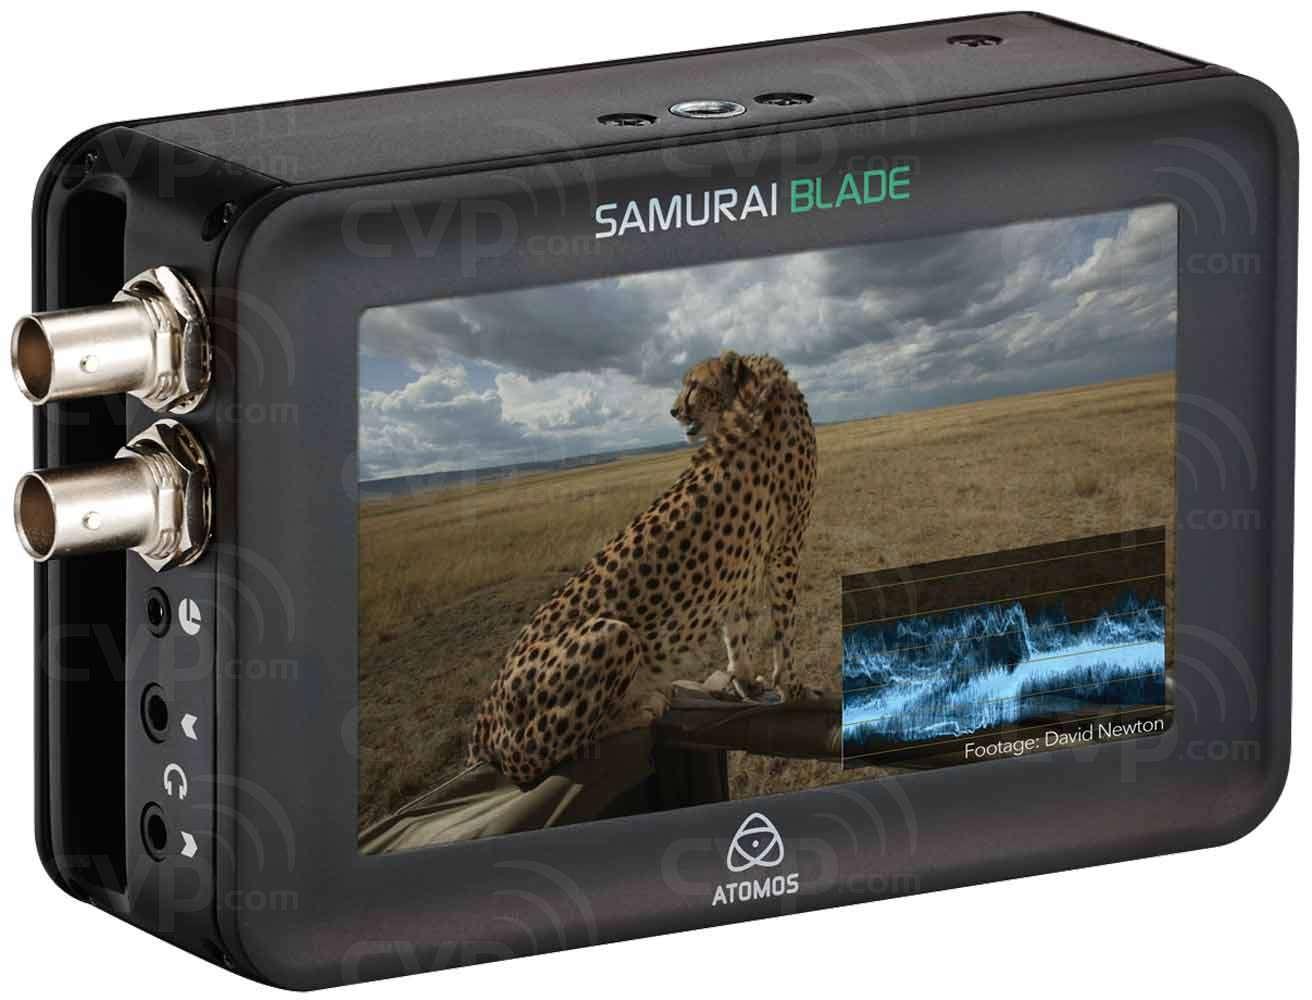 Atomos Samurai Blade - Camera-Mounted Recorder, Monitor, WFM & Deck